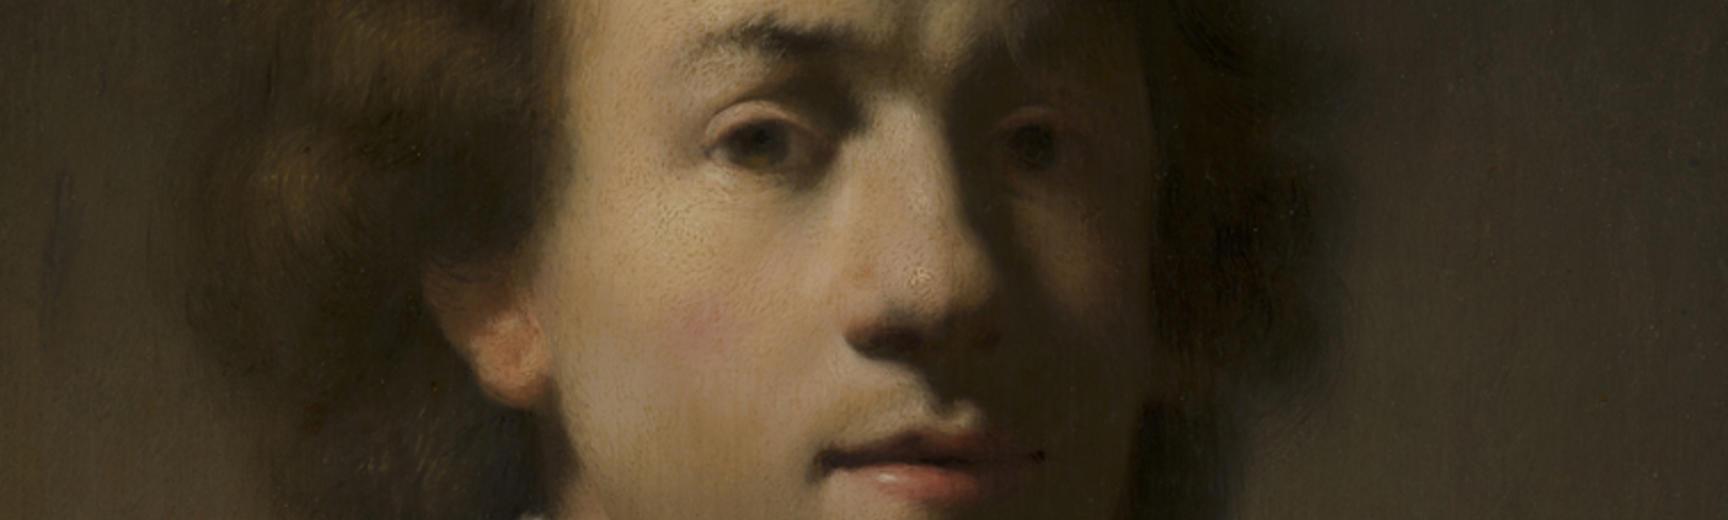 2020 Young Rembrandt Exhibition – Gerrit Dou after Rembrandt, Portrait of Rembrandt with a Gorget, c. 1630 © Mauritshuis, The Hague